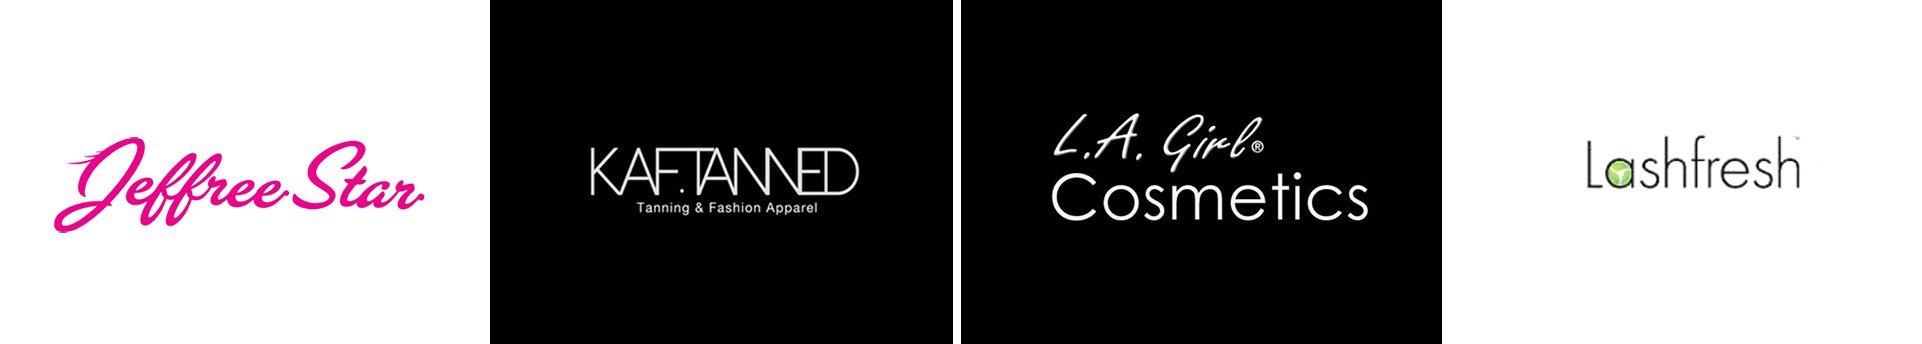 the makeup mirror jeffree star logo kaftanned logo l a girl logo lash fresh logo